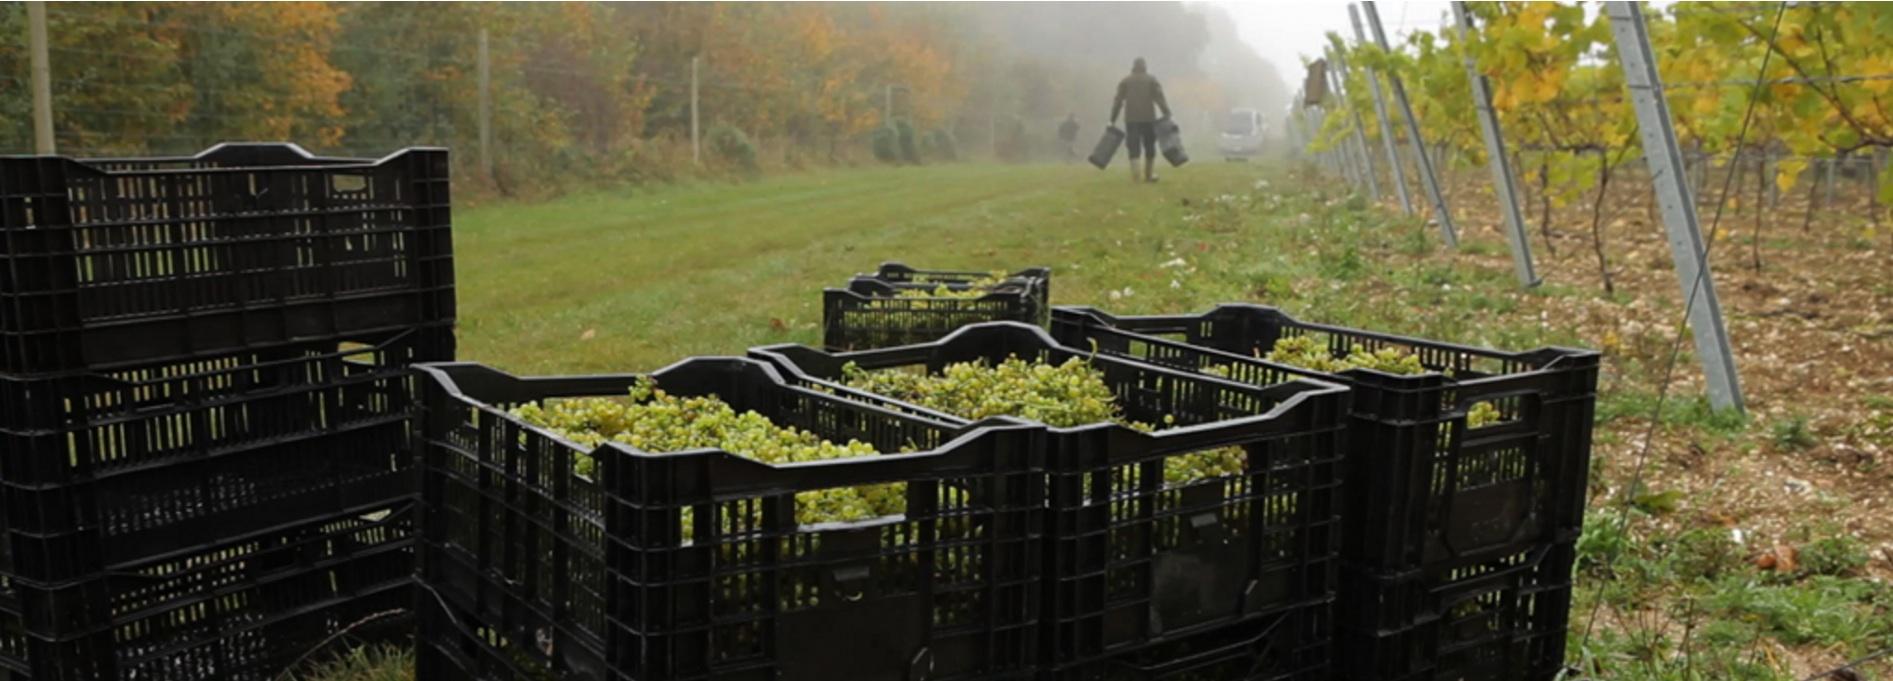 Hattingley Valley Grape Harvest